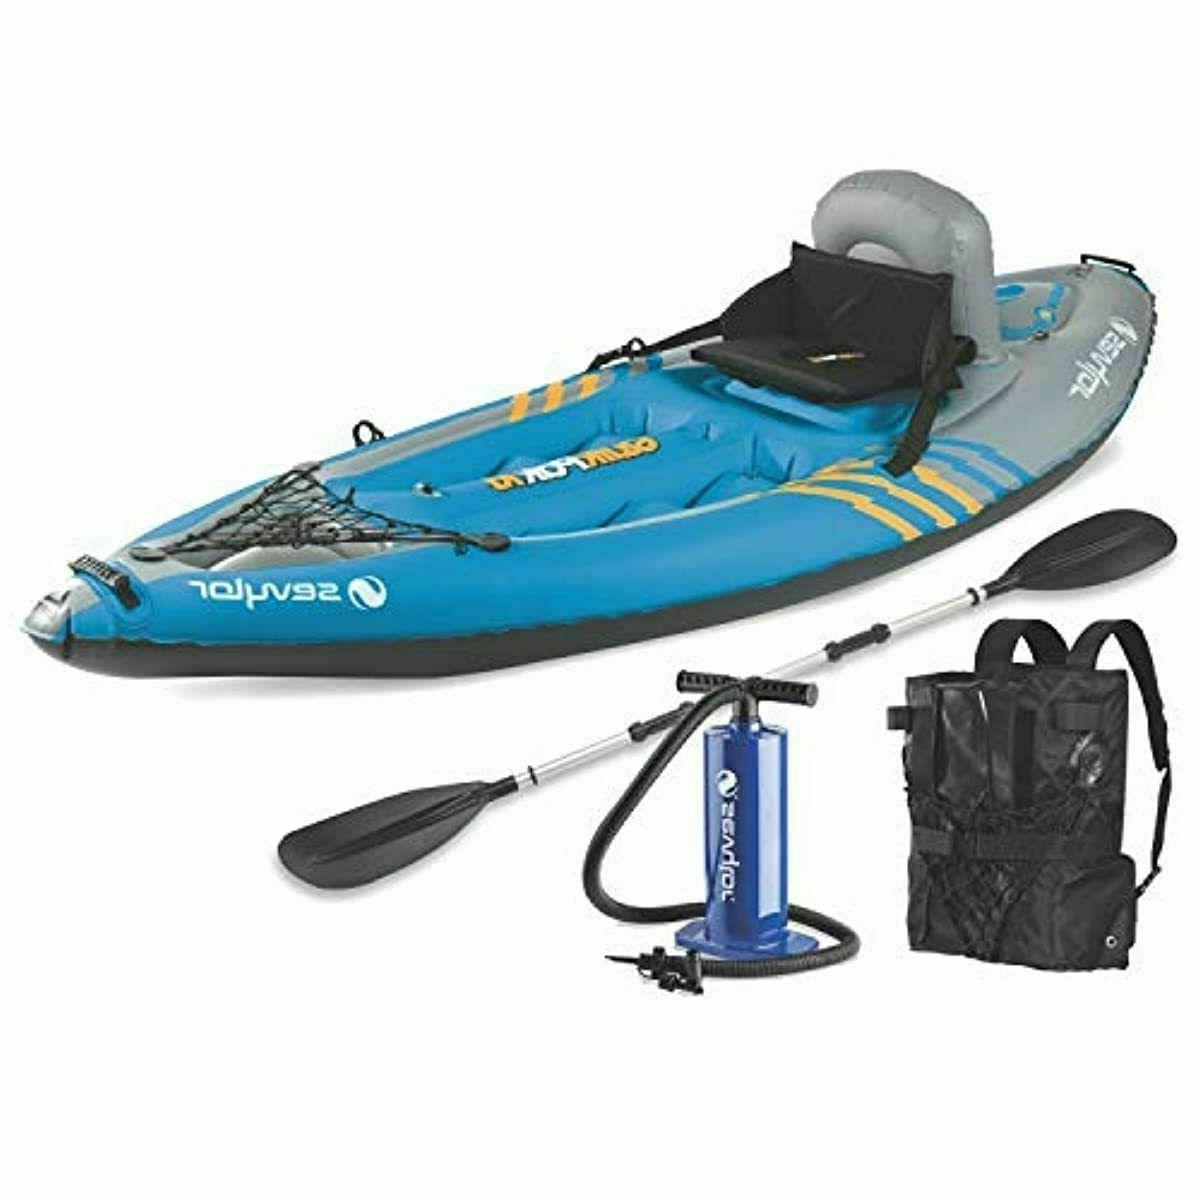 quikpak k1 1 person kayak blue 8